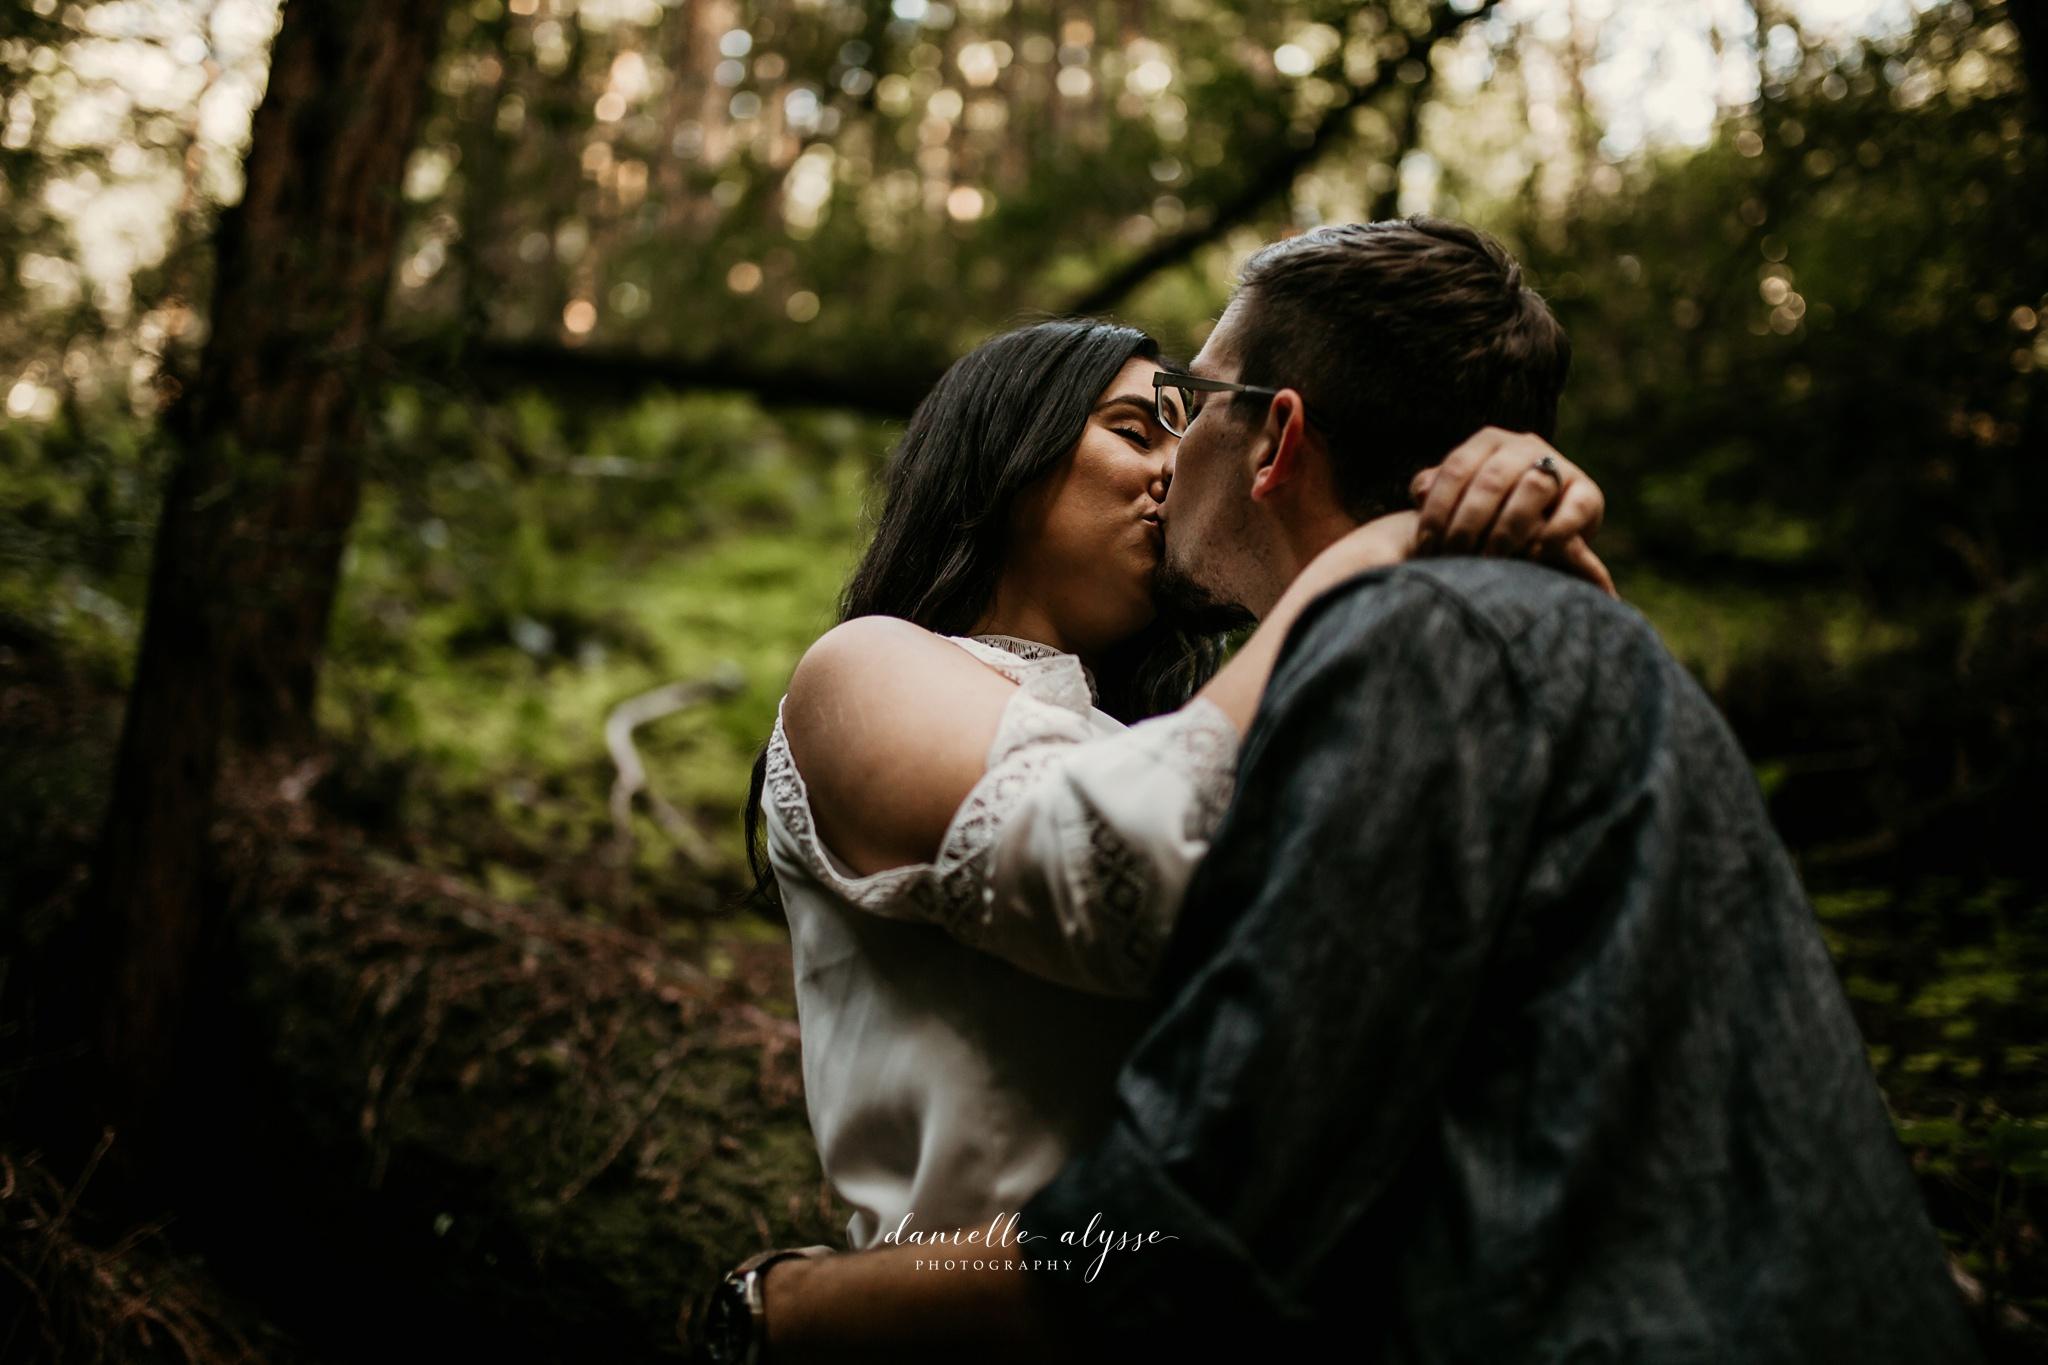 180503_engagement_bianca_muir_woods_mill_valley_danielle_alysse_photography_bay_area_photographer_blog_38_WEB.jpg